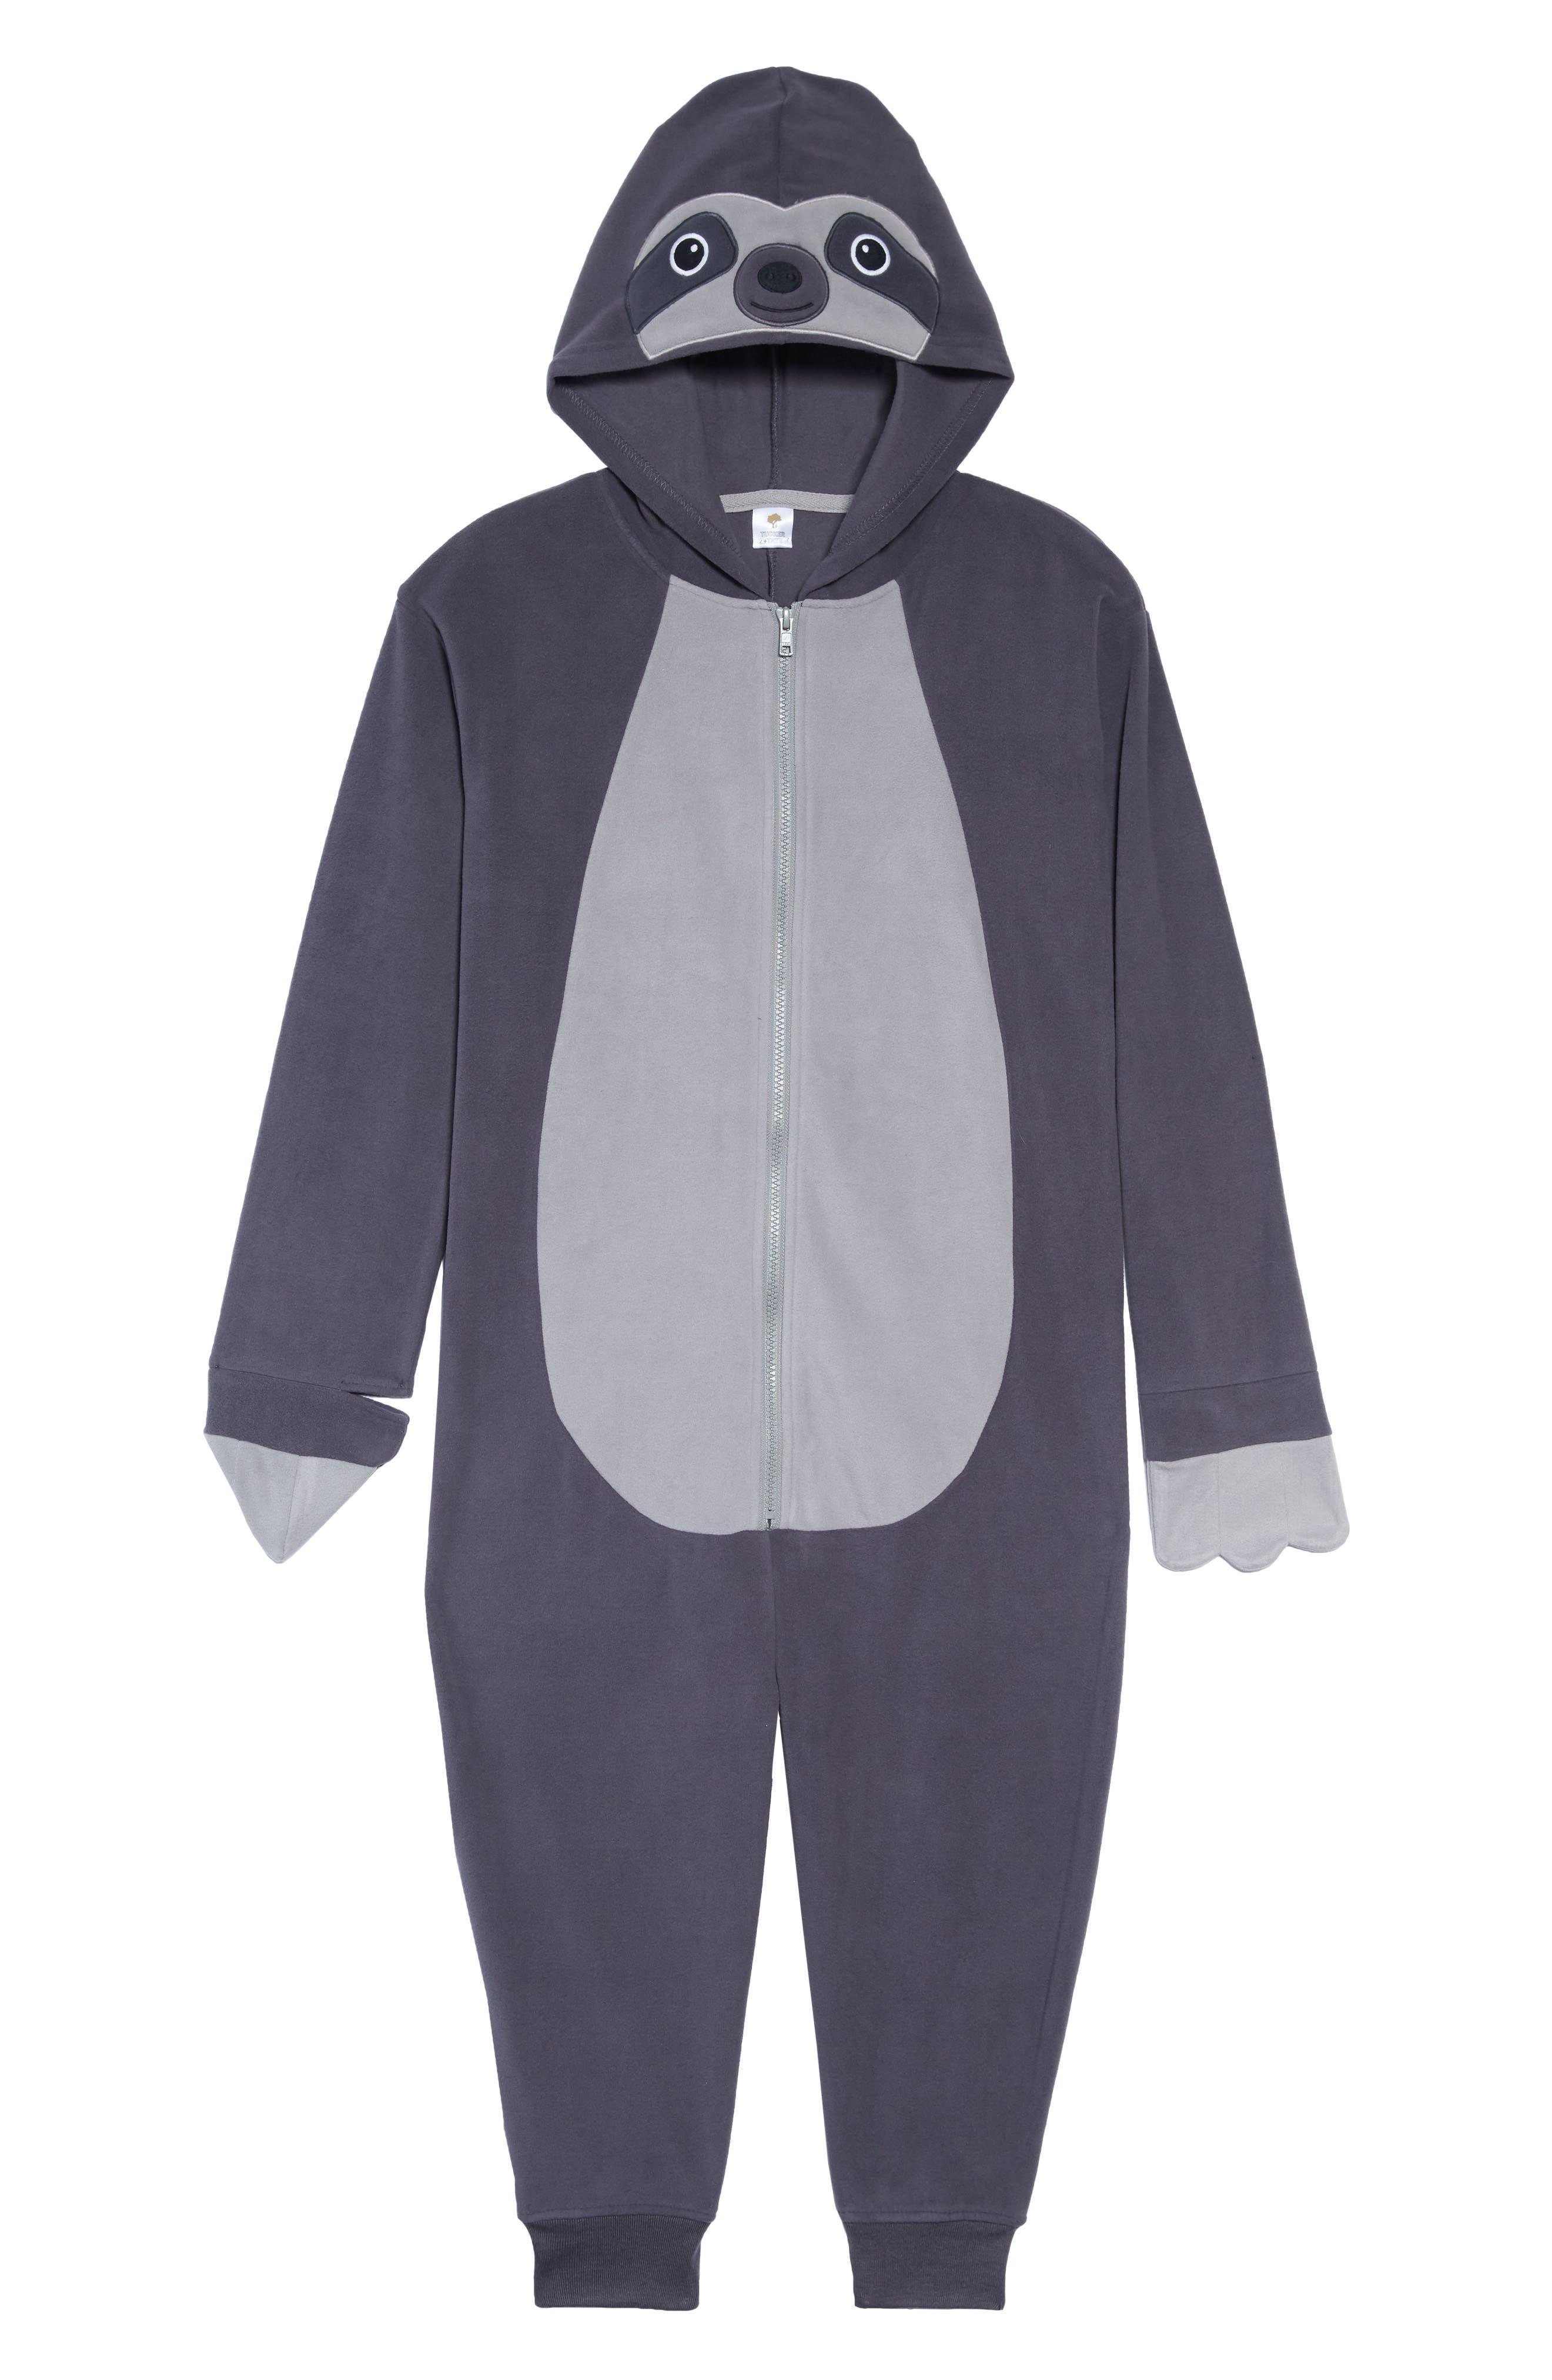 Sloth Hooded One-Piece Pajamas,                         Main,                         color, GREY STONEHENGE SLOTH